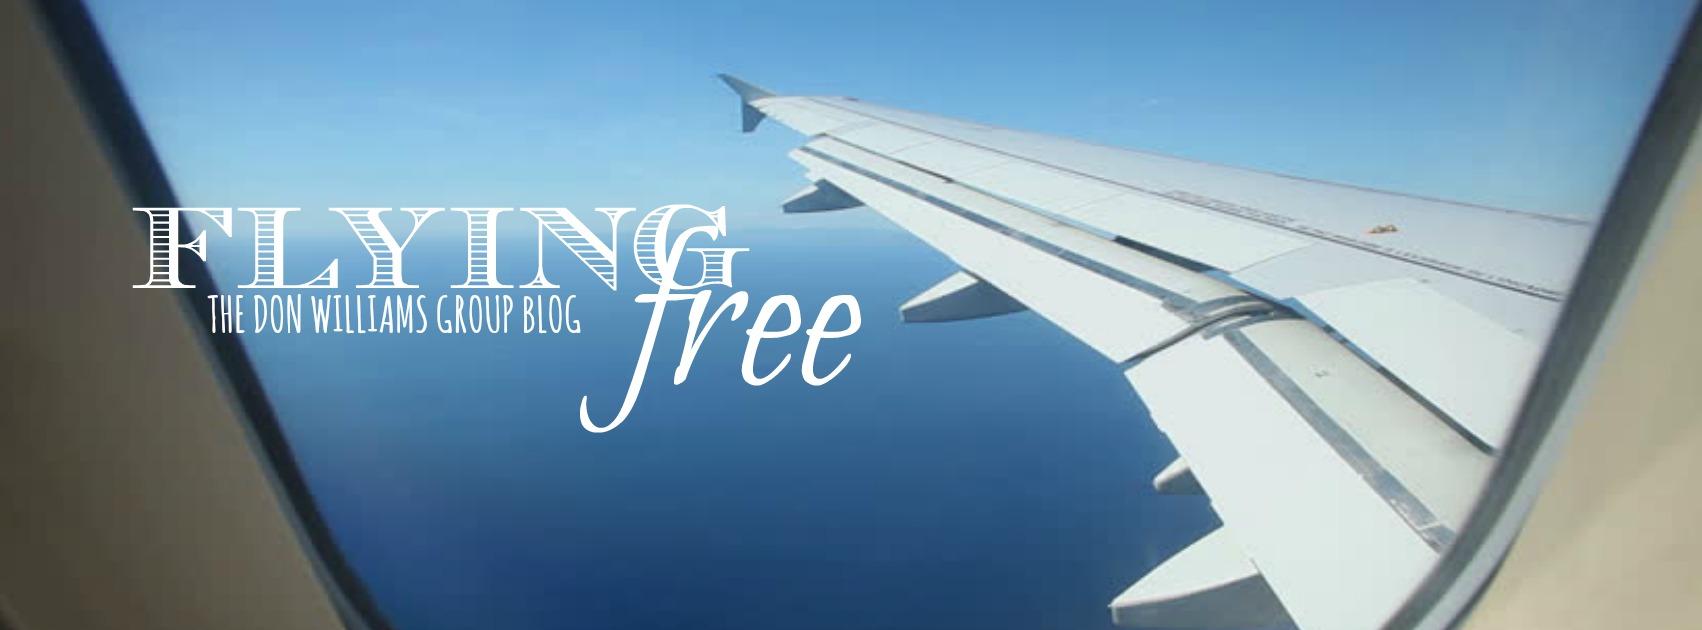 FLYING FREE.JPG